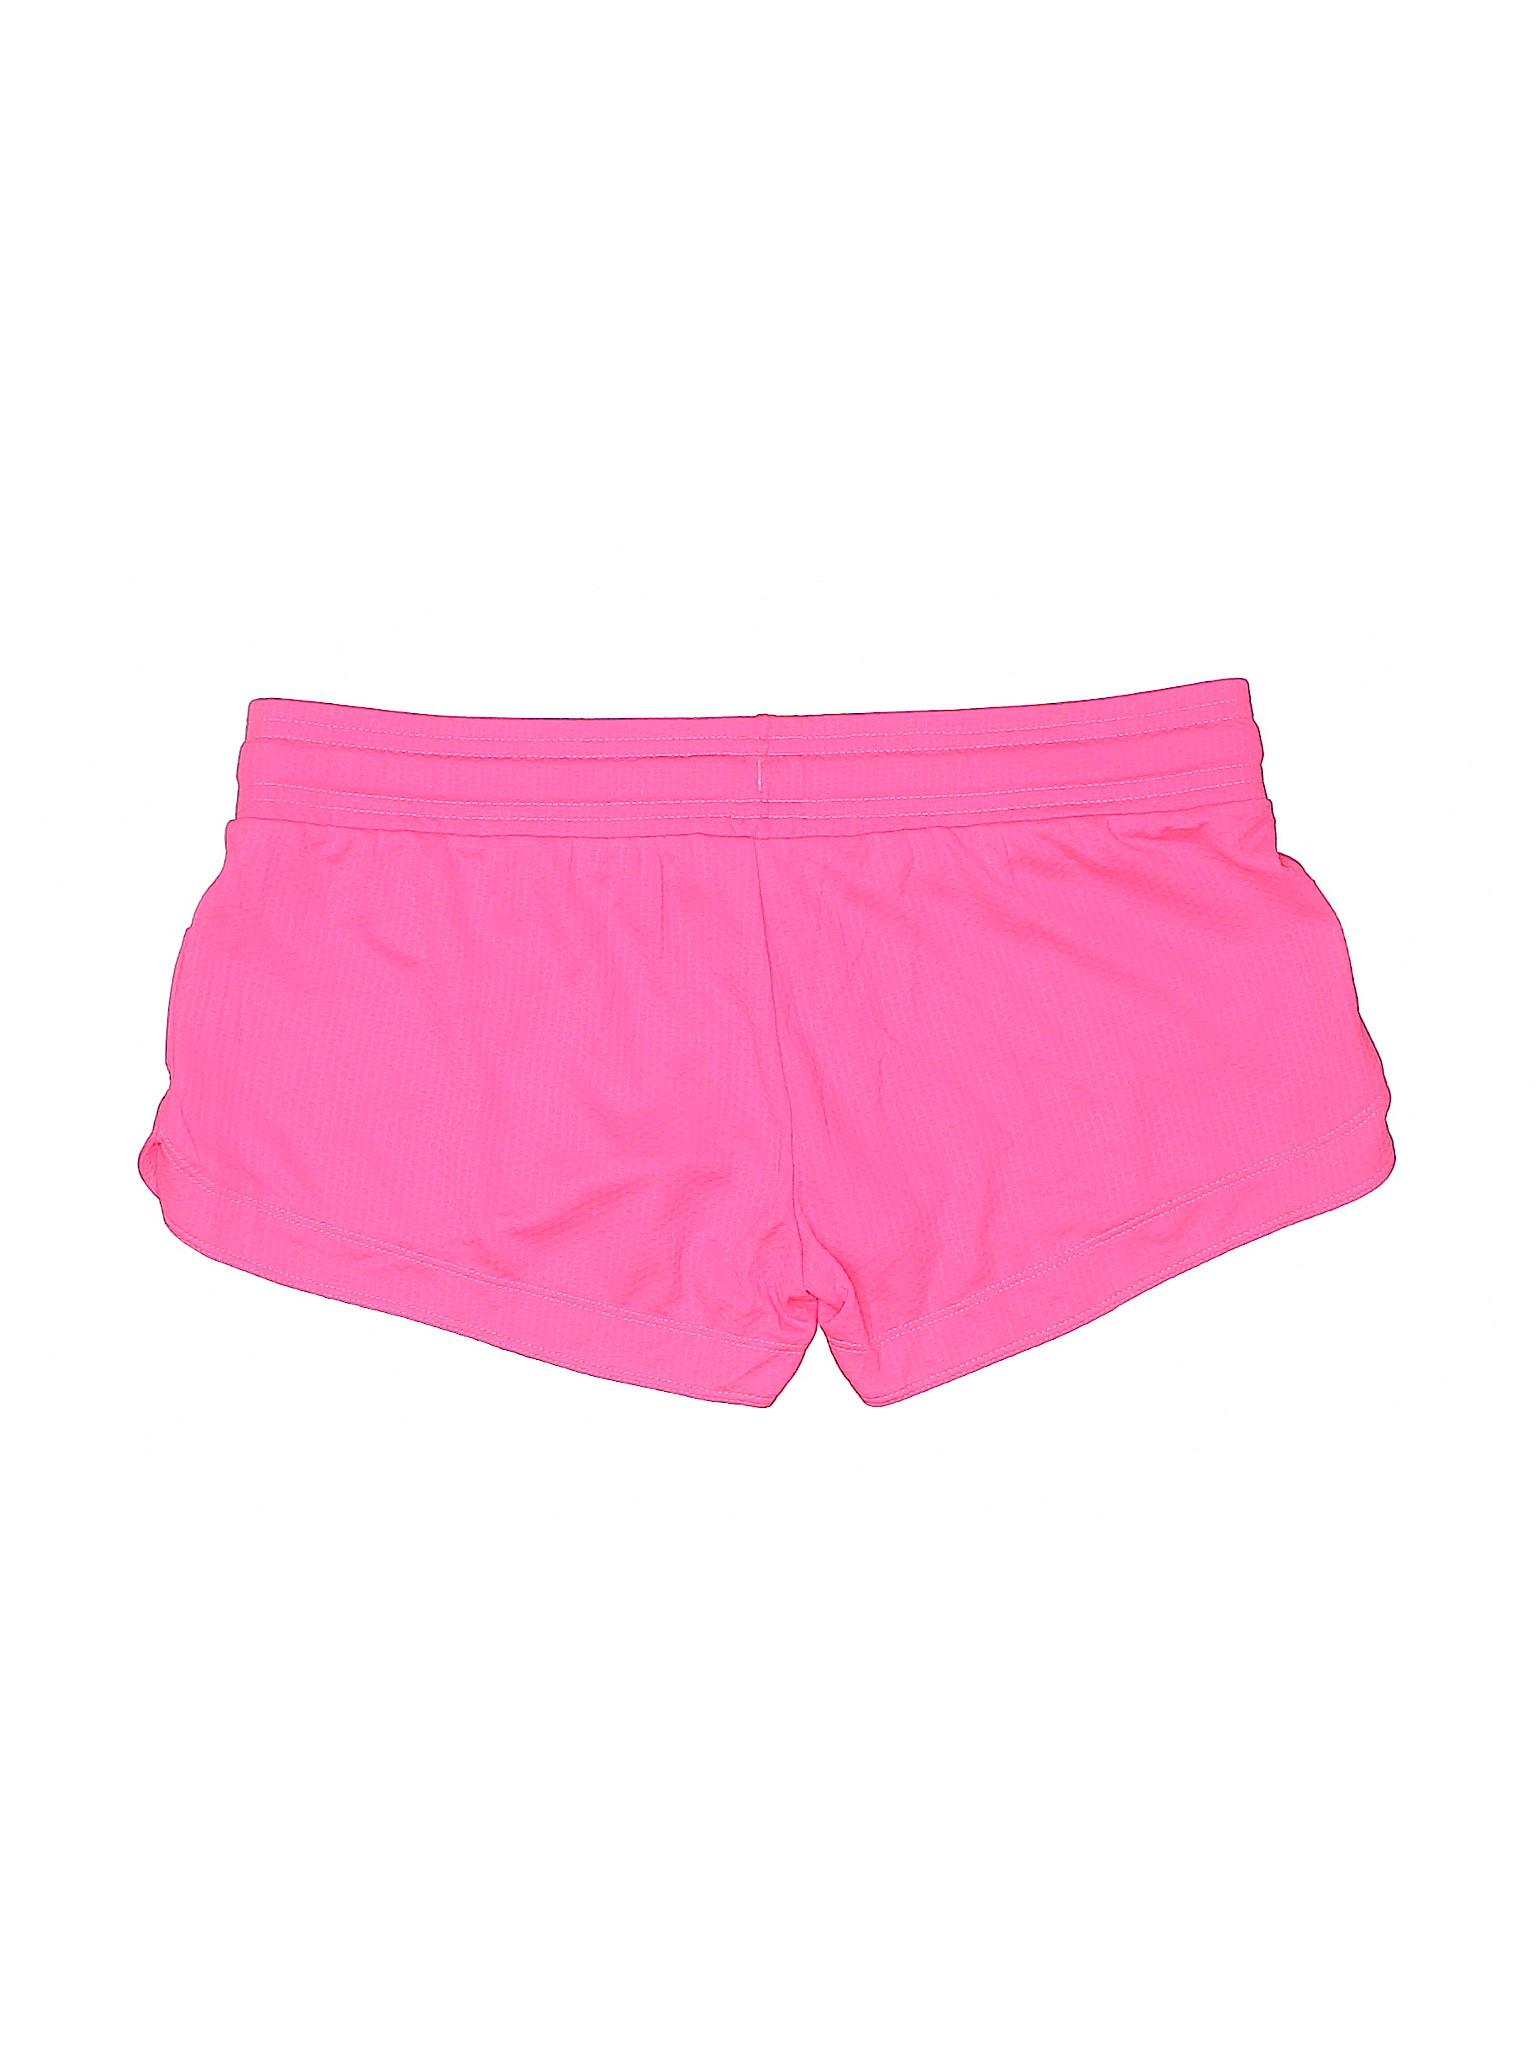 Athletic SOFFE Shorts Boutique Boutique SOFFE wUqH6U